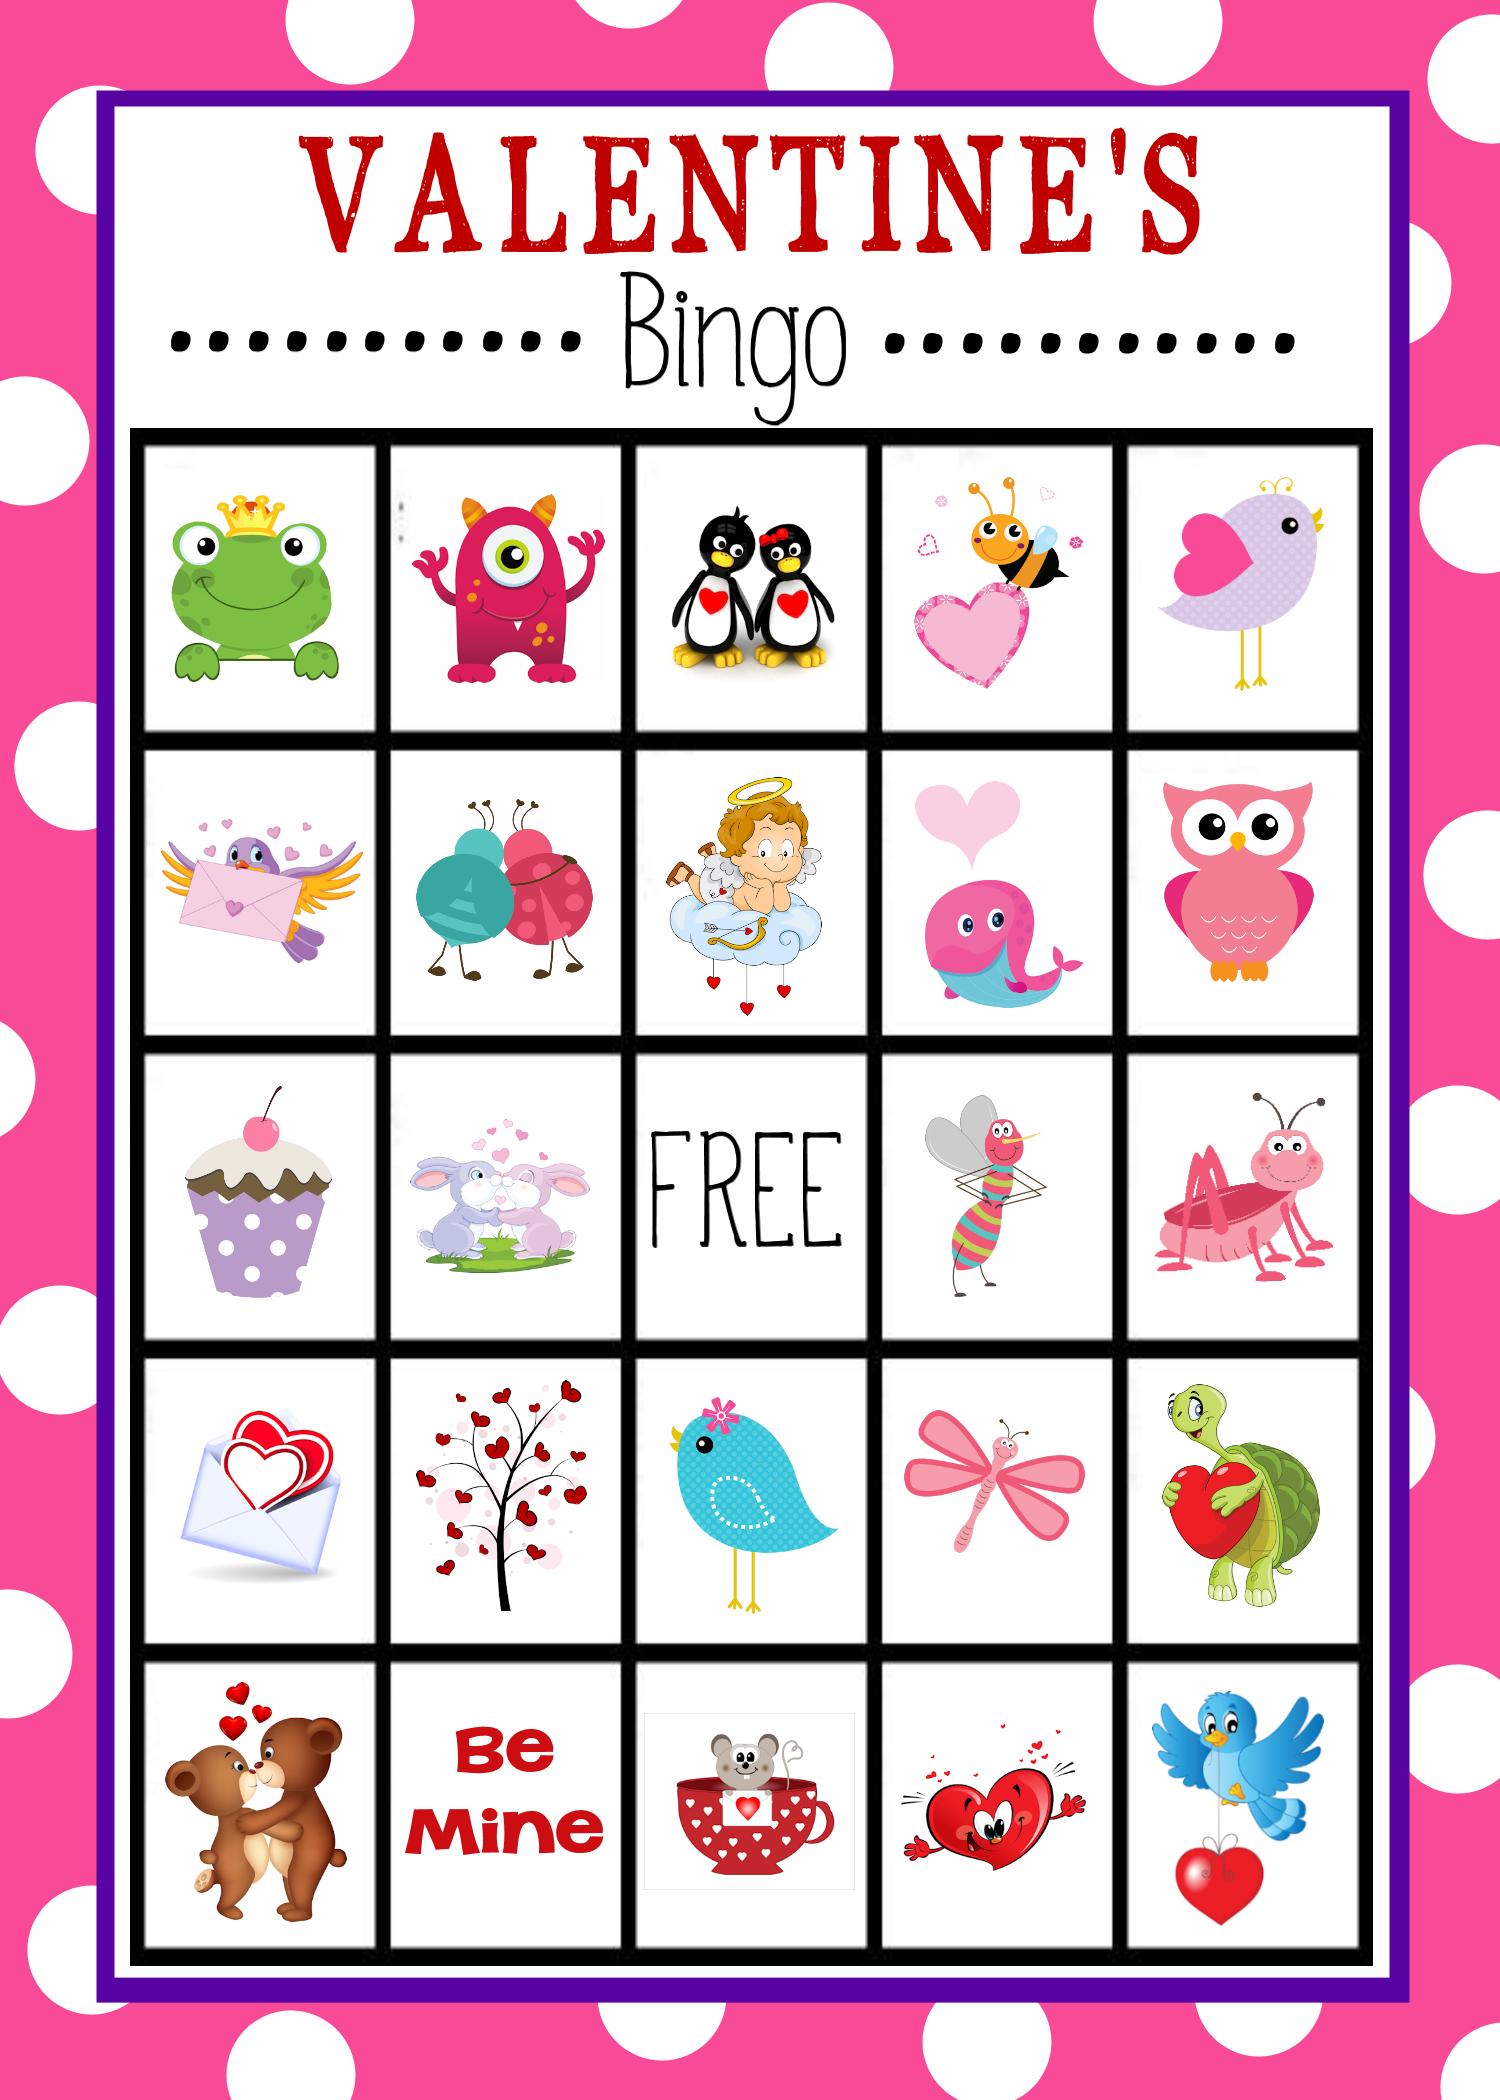 Valentine's Bingo Game To Print & Play | Valentine's Day Activities - Free Printable Valentines Bingo